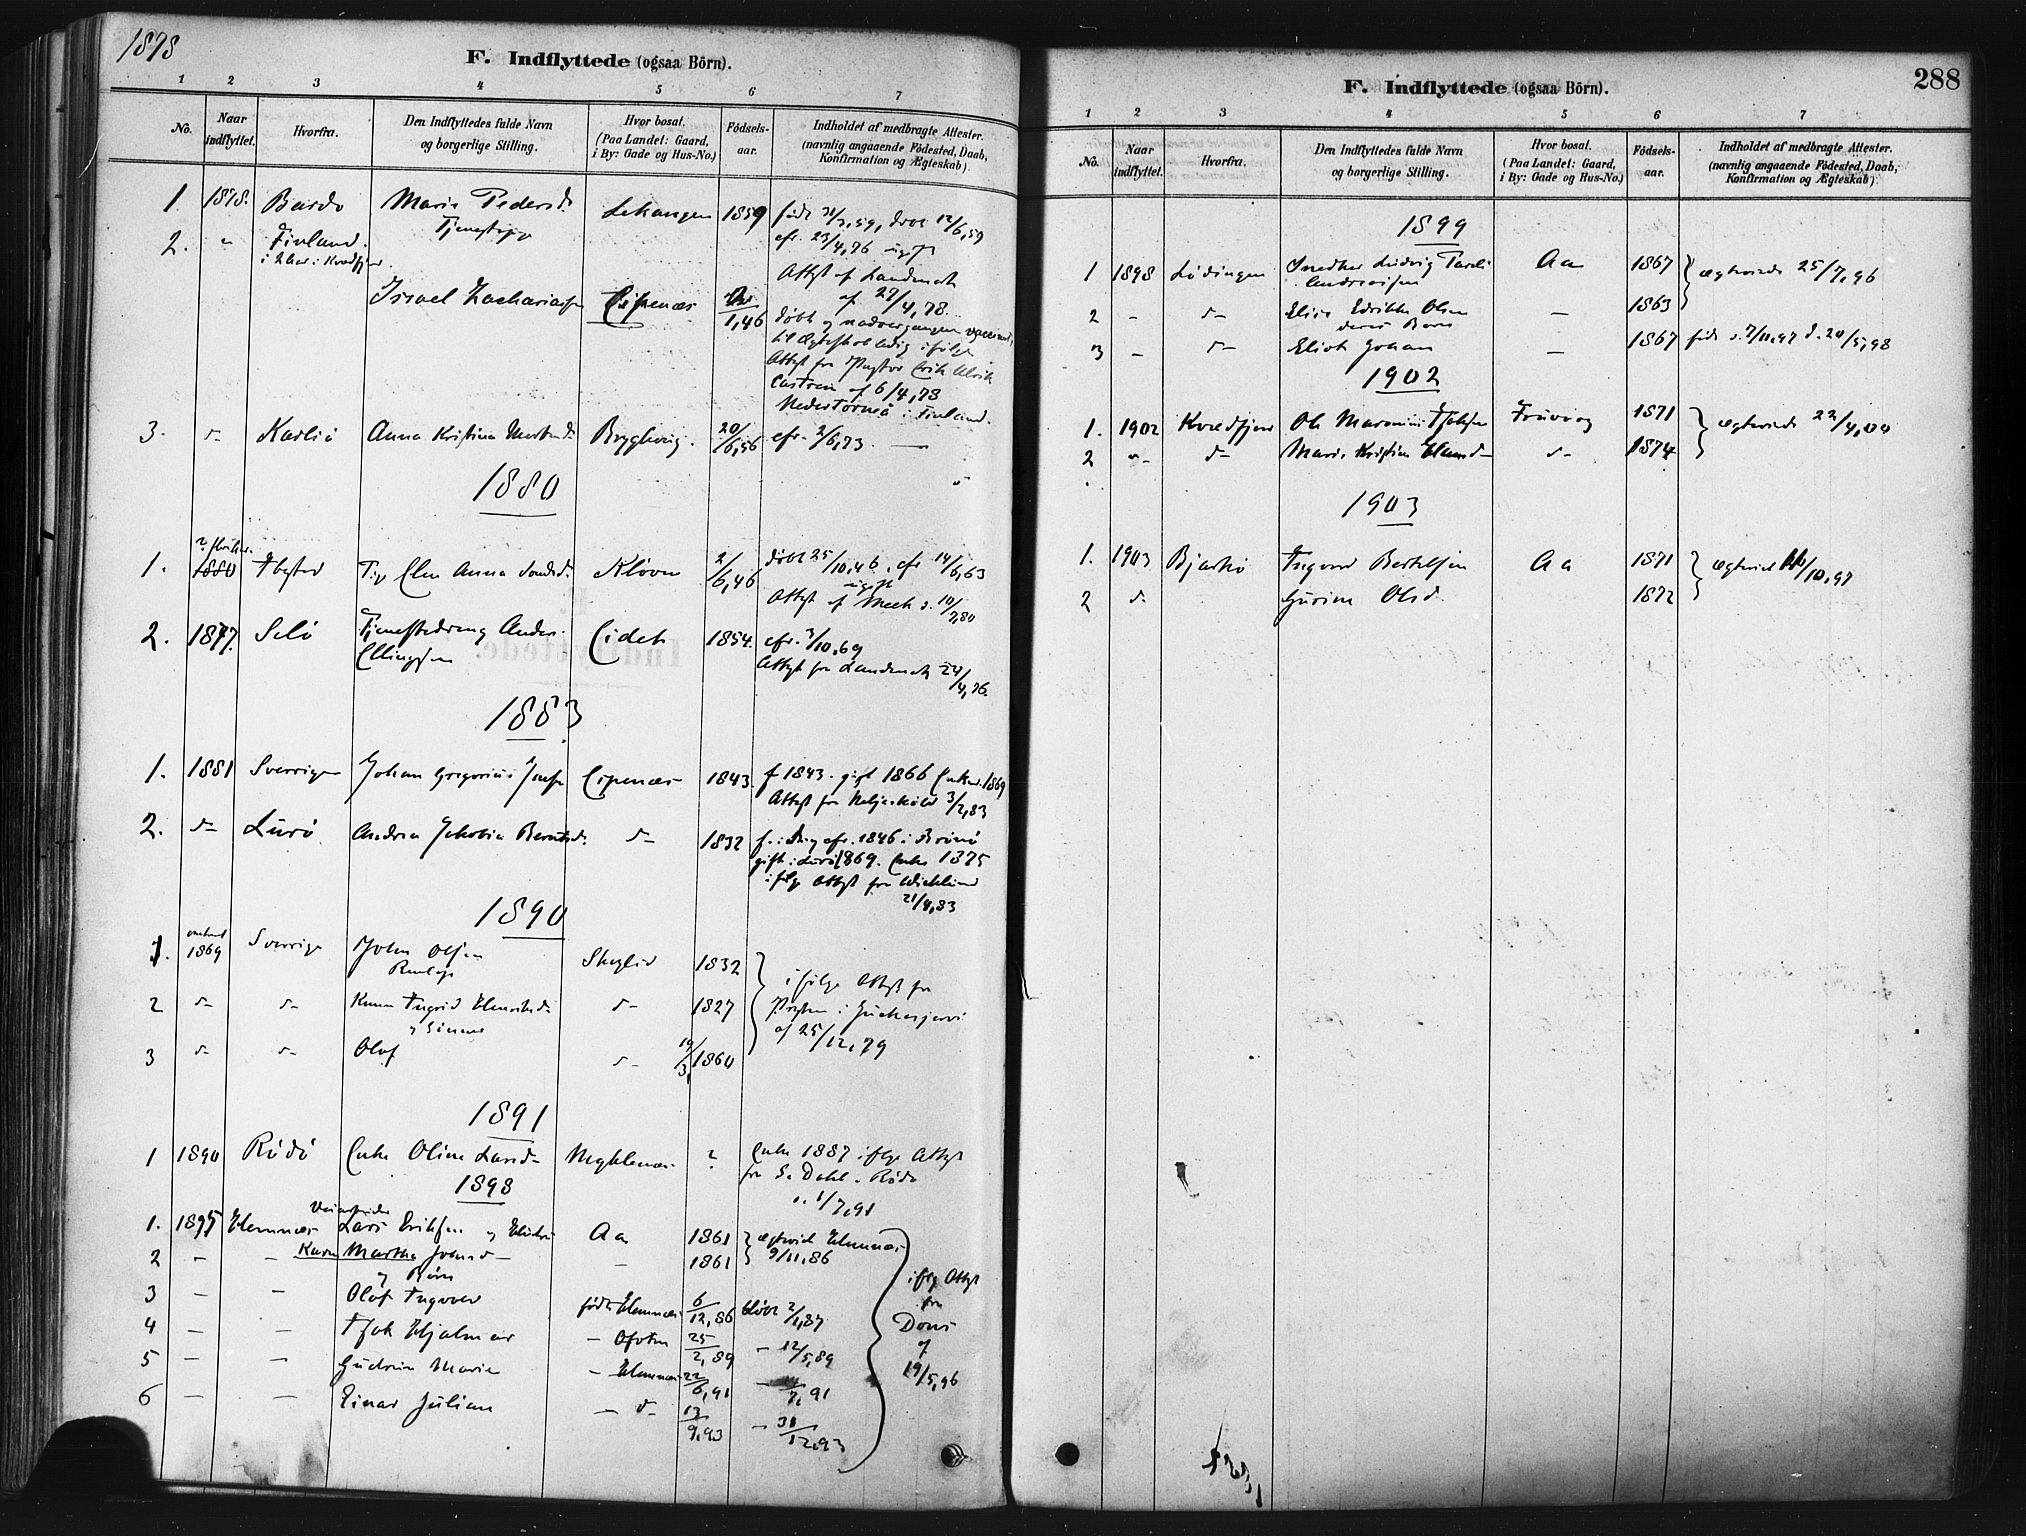 SATØ, Tranøy sokneprestkontor, I/Ia/Iaa/L0009kirke: Ministerialbok nr. 9, 1878-1904, s. 288